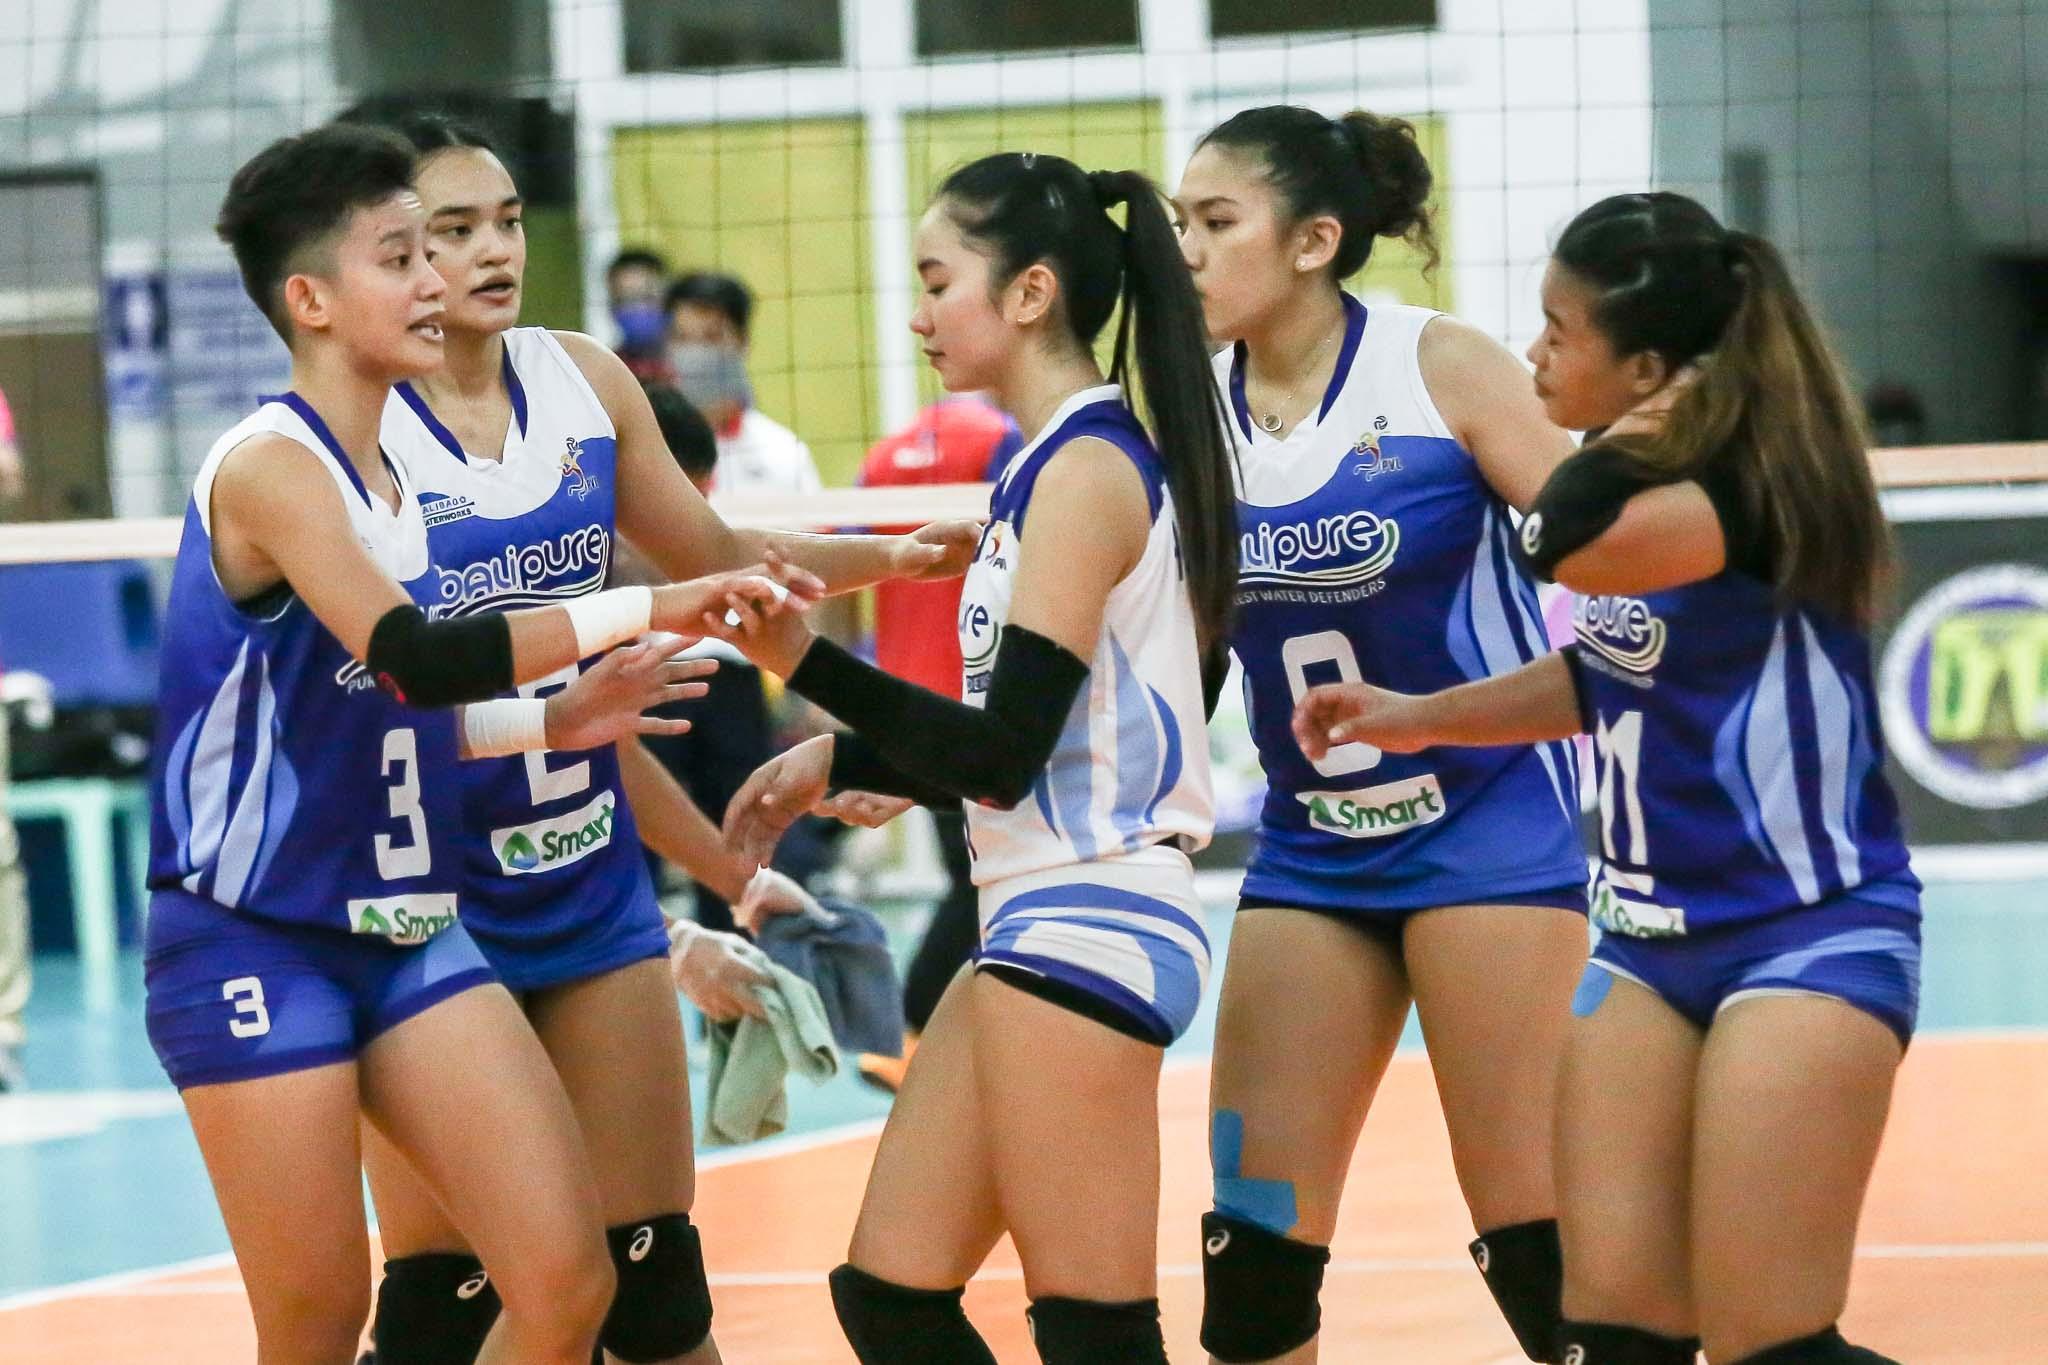 2021-PVL-Open-Creamline-vs-BaliPure-Balipure-team Alyssa Valdez knows BaliPure will come out better News PVL Volleyball  - philippine sports news